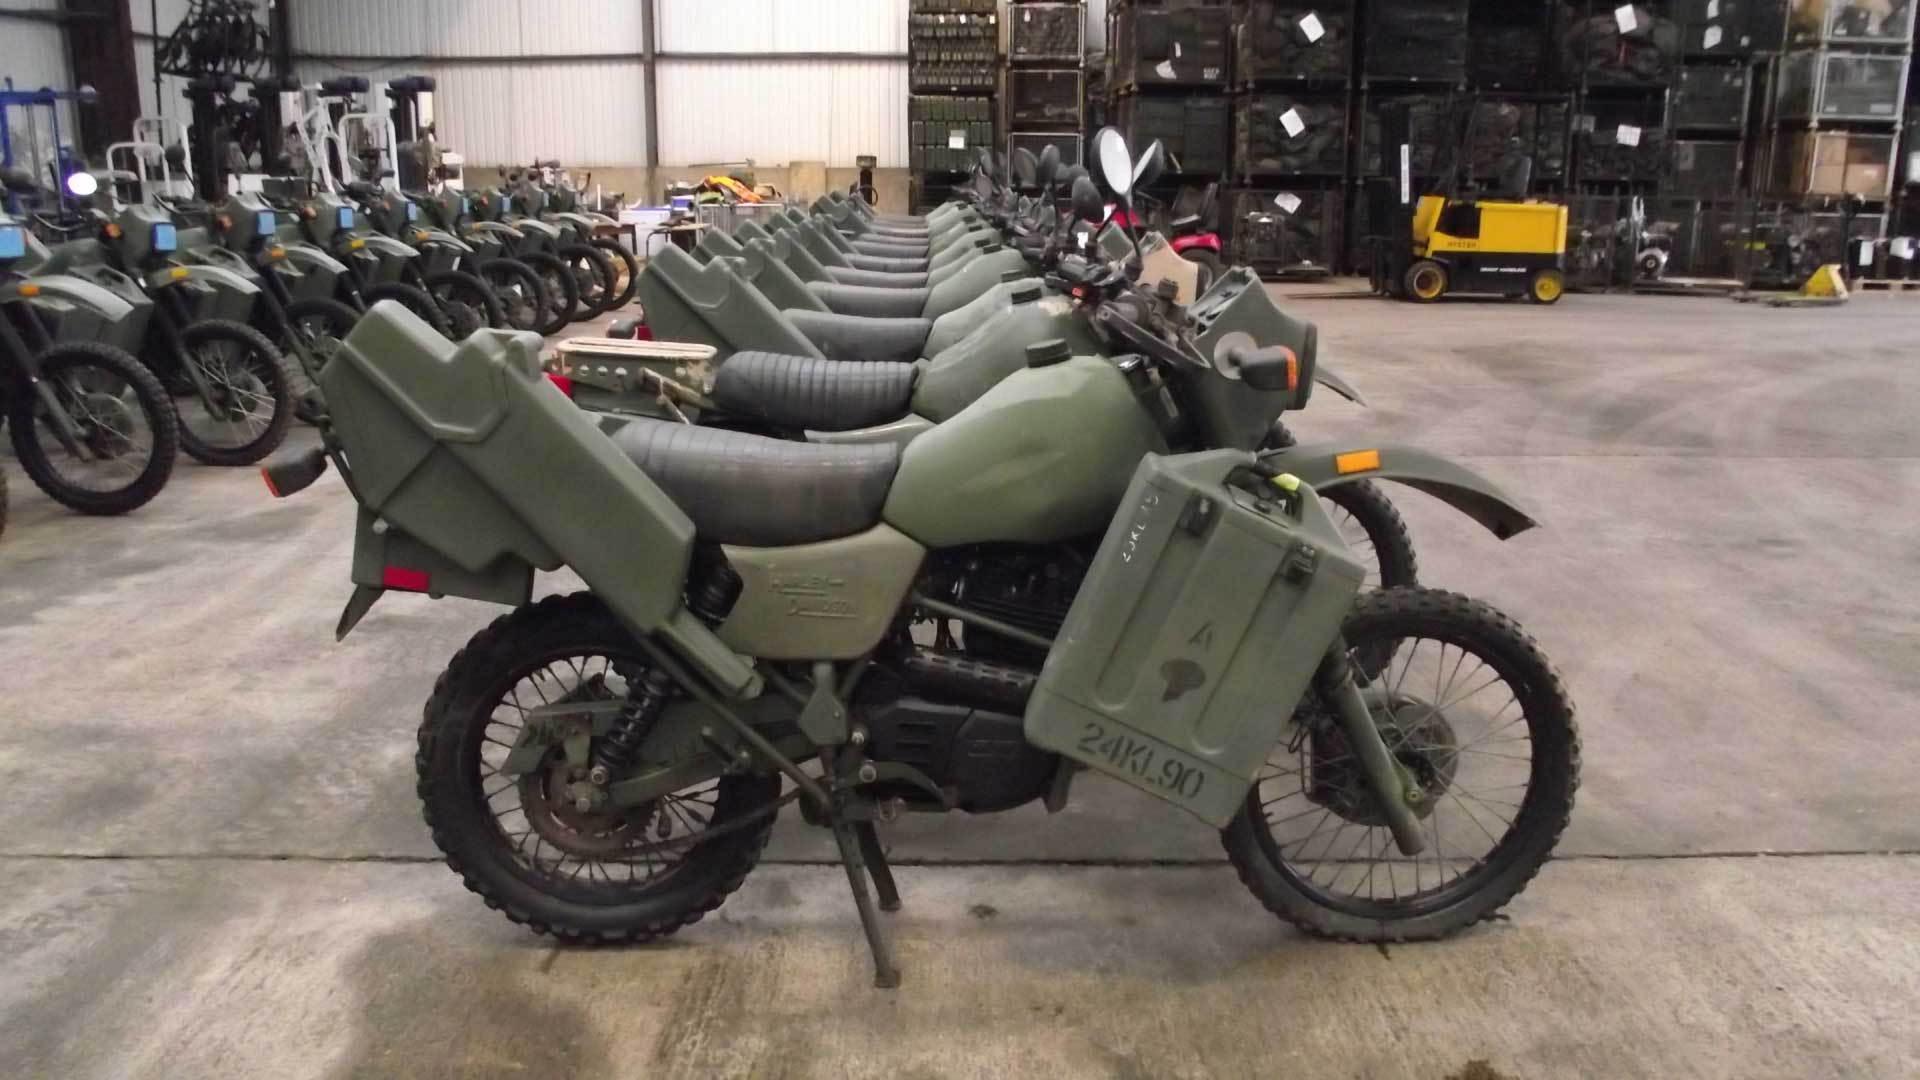 Harley Davidson Dirt Bike For Army